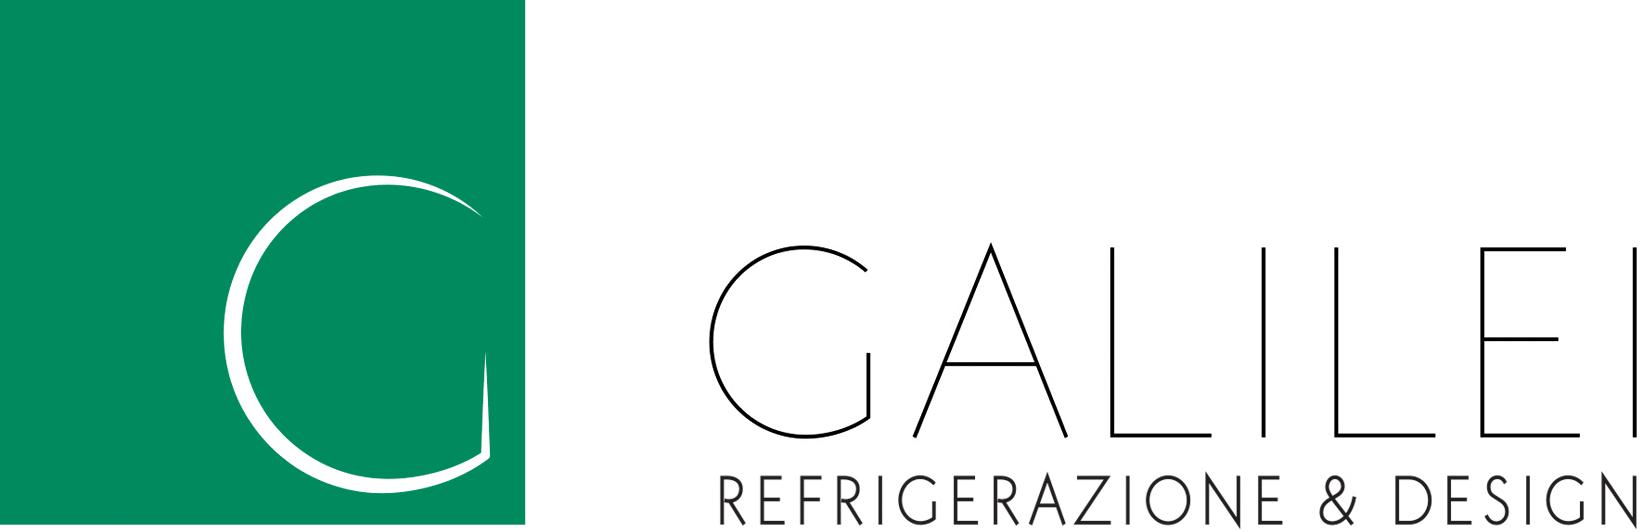 Galilei Réfrigération